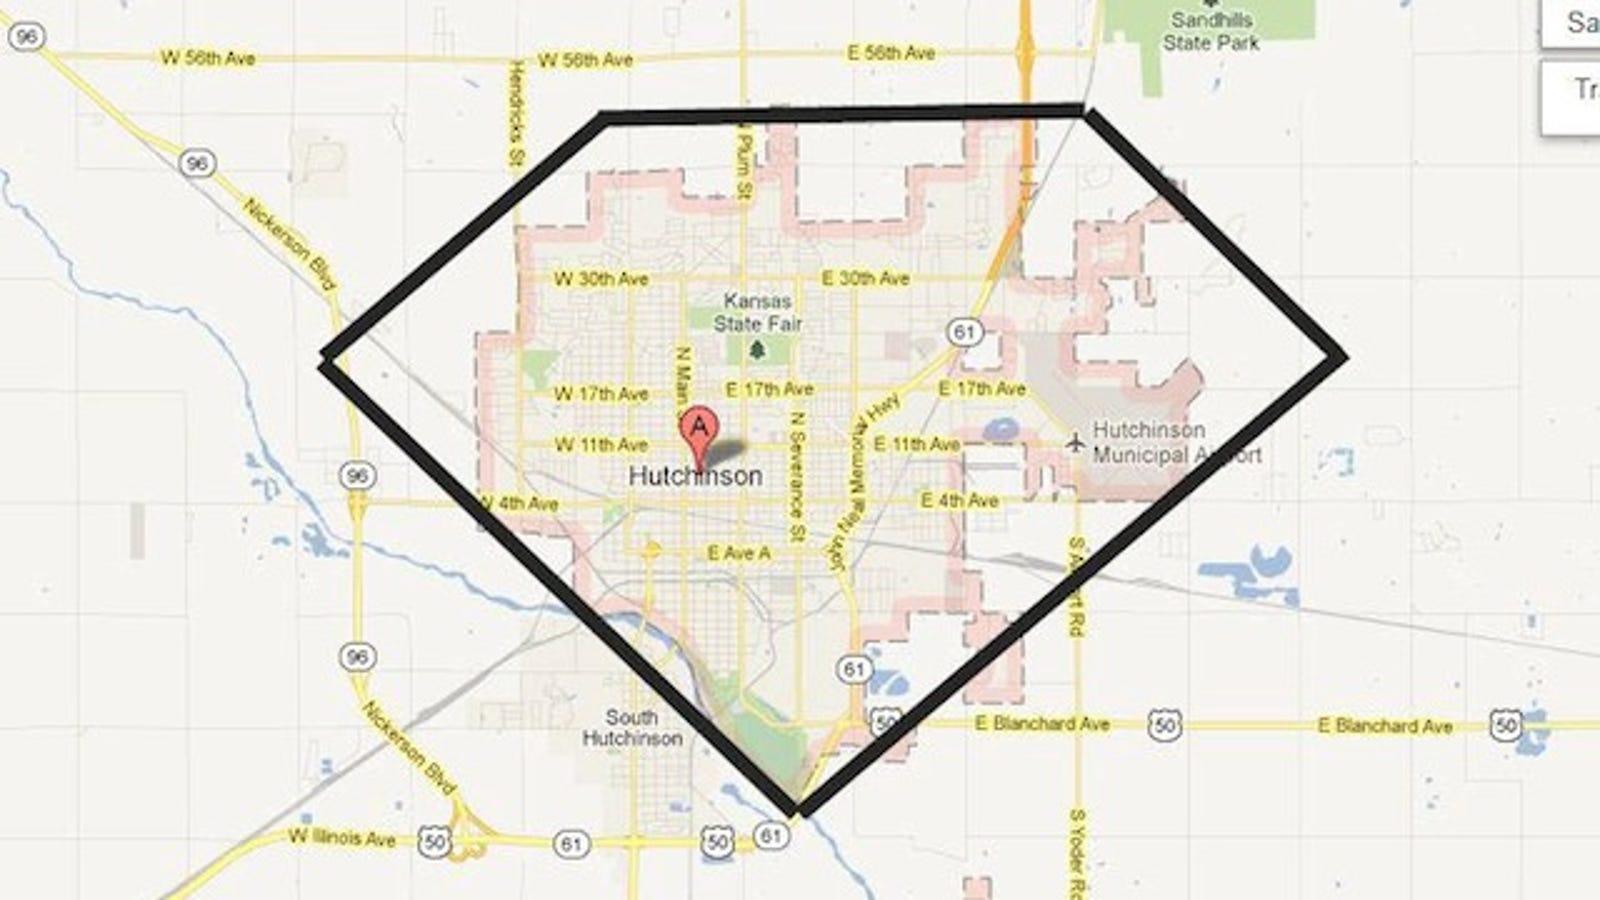 Kansas Comic Book Artist Wants His Town Renamed Smallville